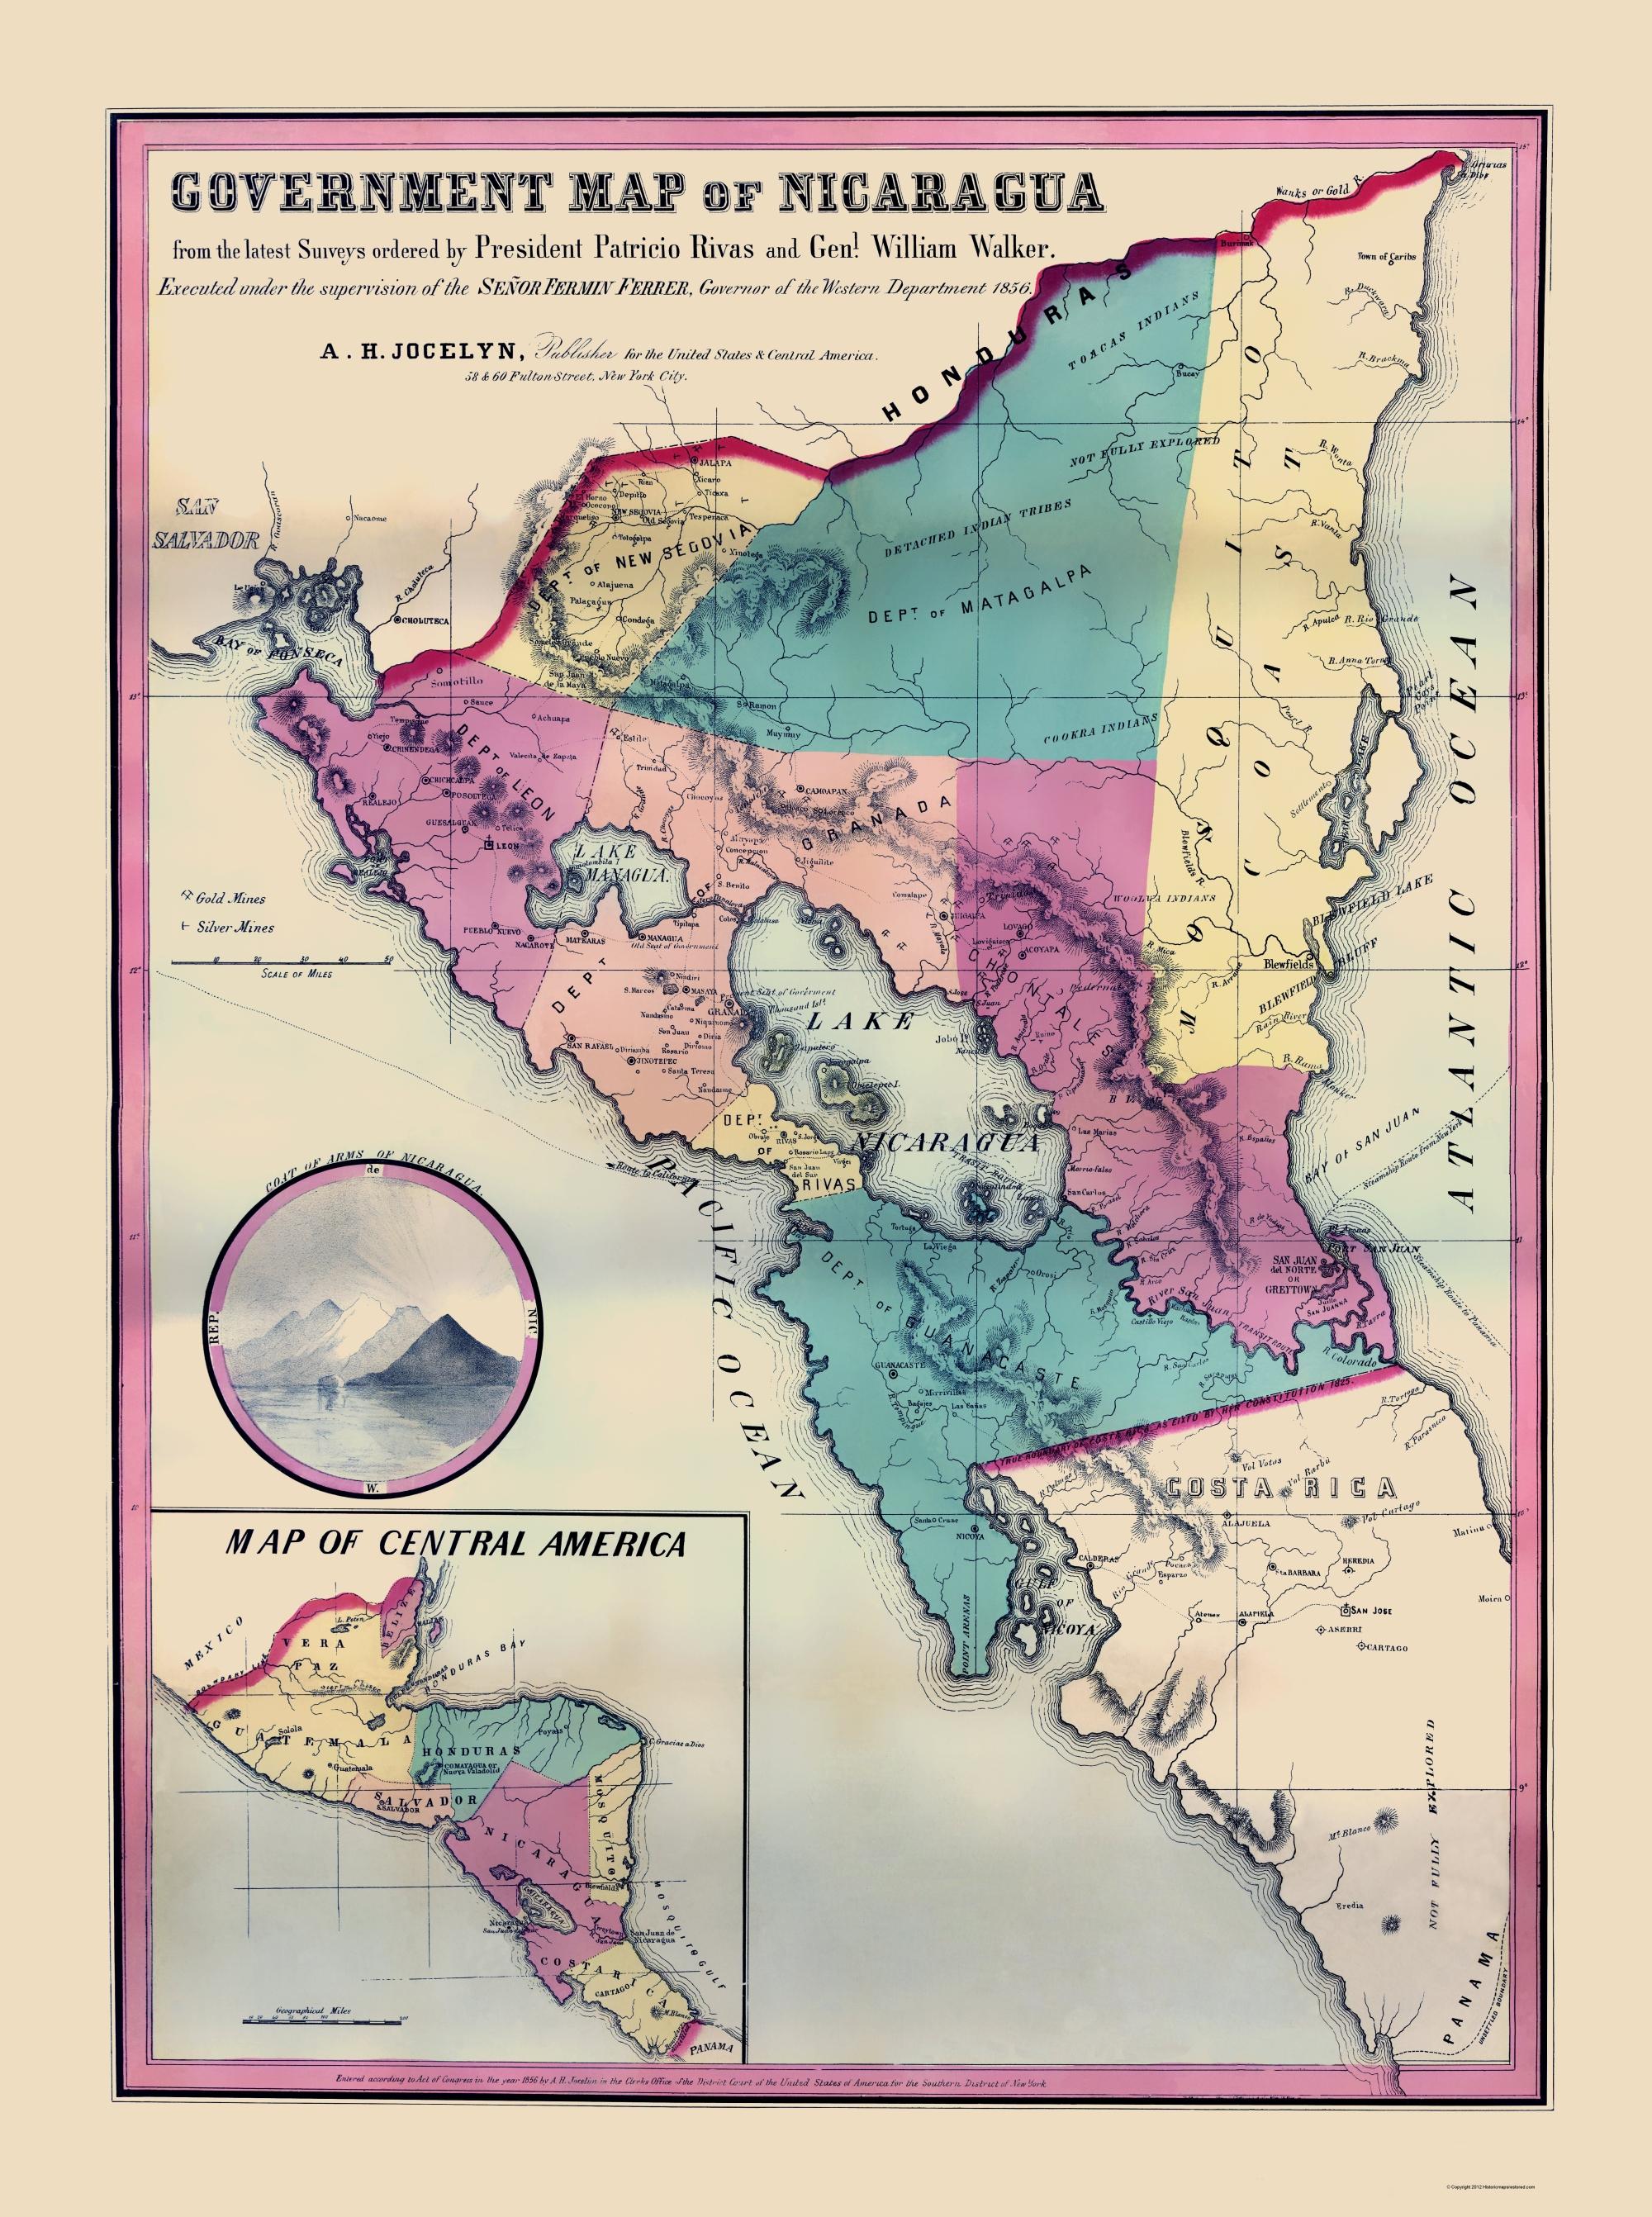 Old Central America Map - Nicaragua - Jocelyn 1856 - 23 x 30.86